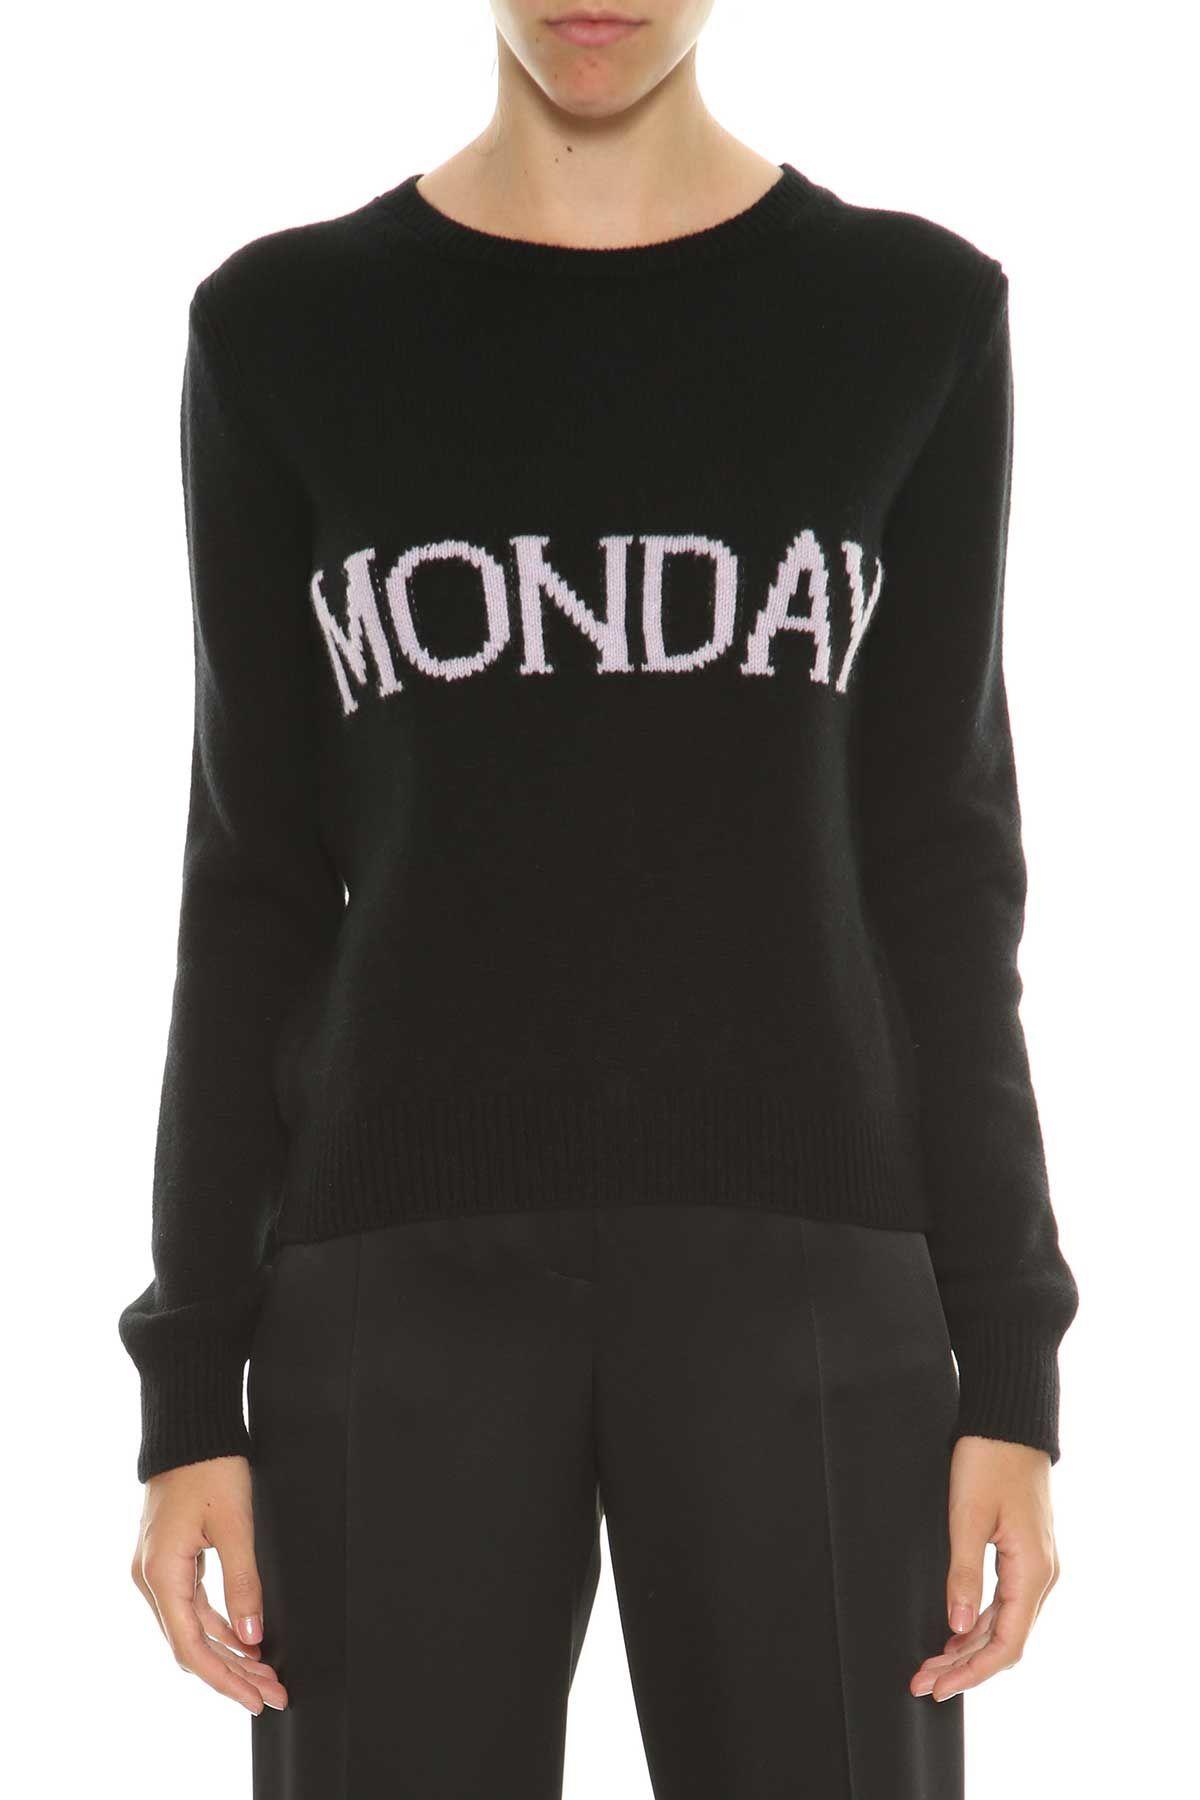 Alberta Ferretti Sweater With monday Writing